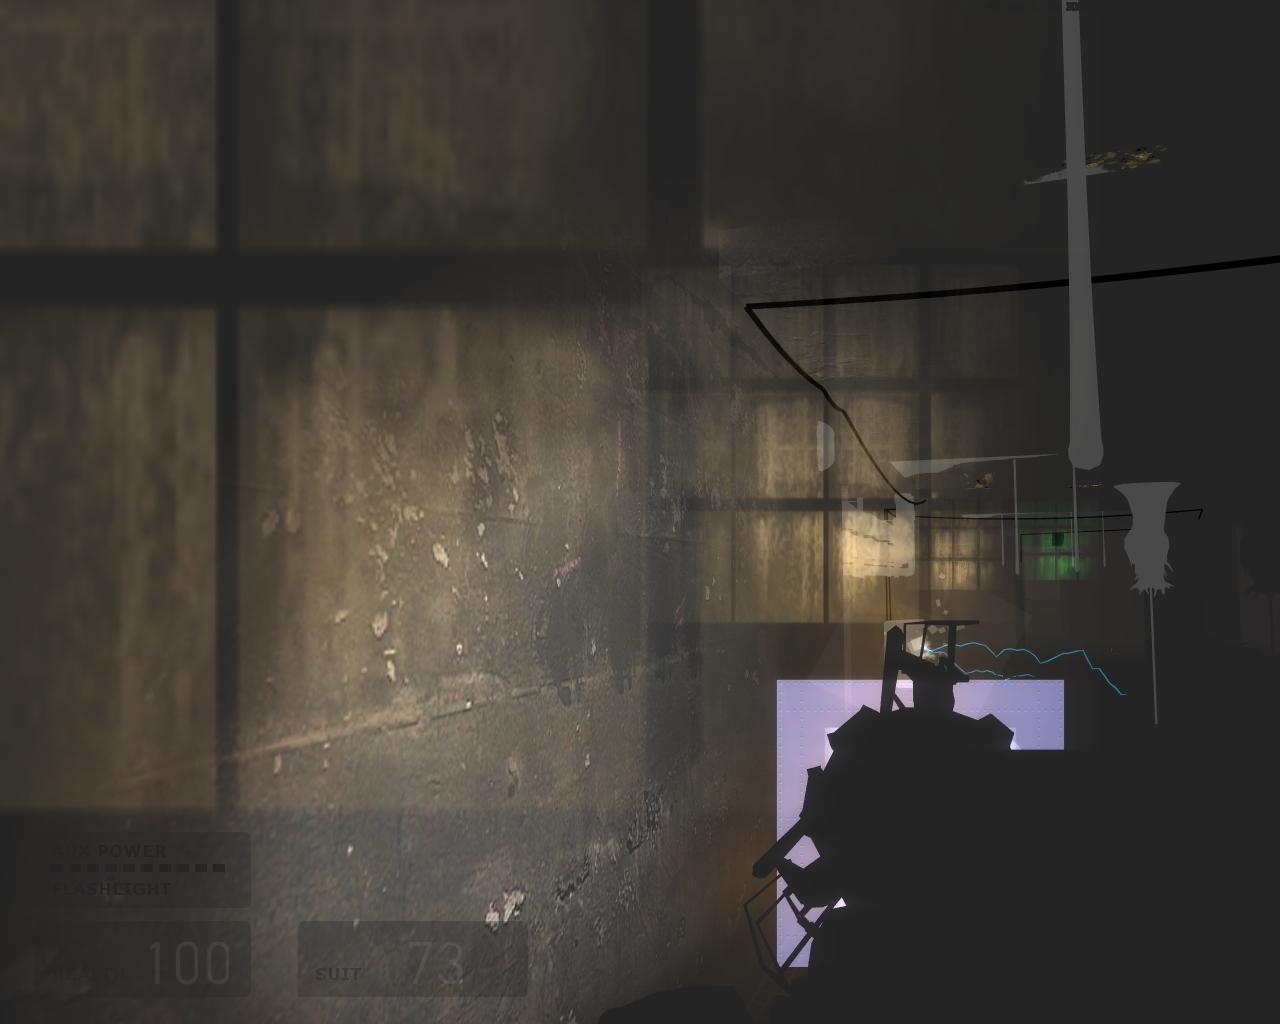 ep1_c17_02a0017.jpg - Half-Life 2